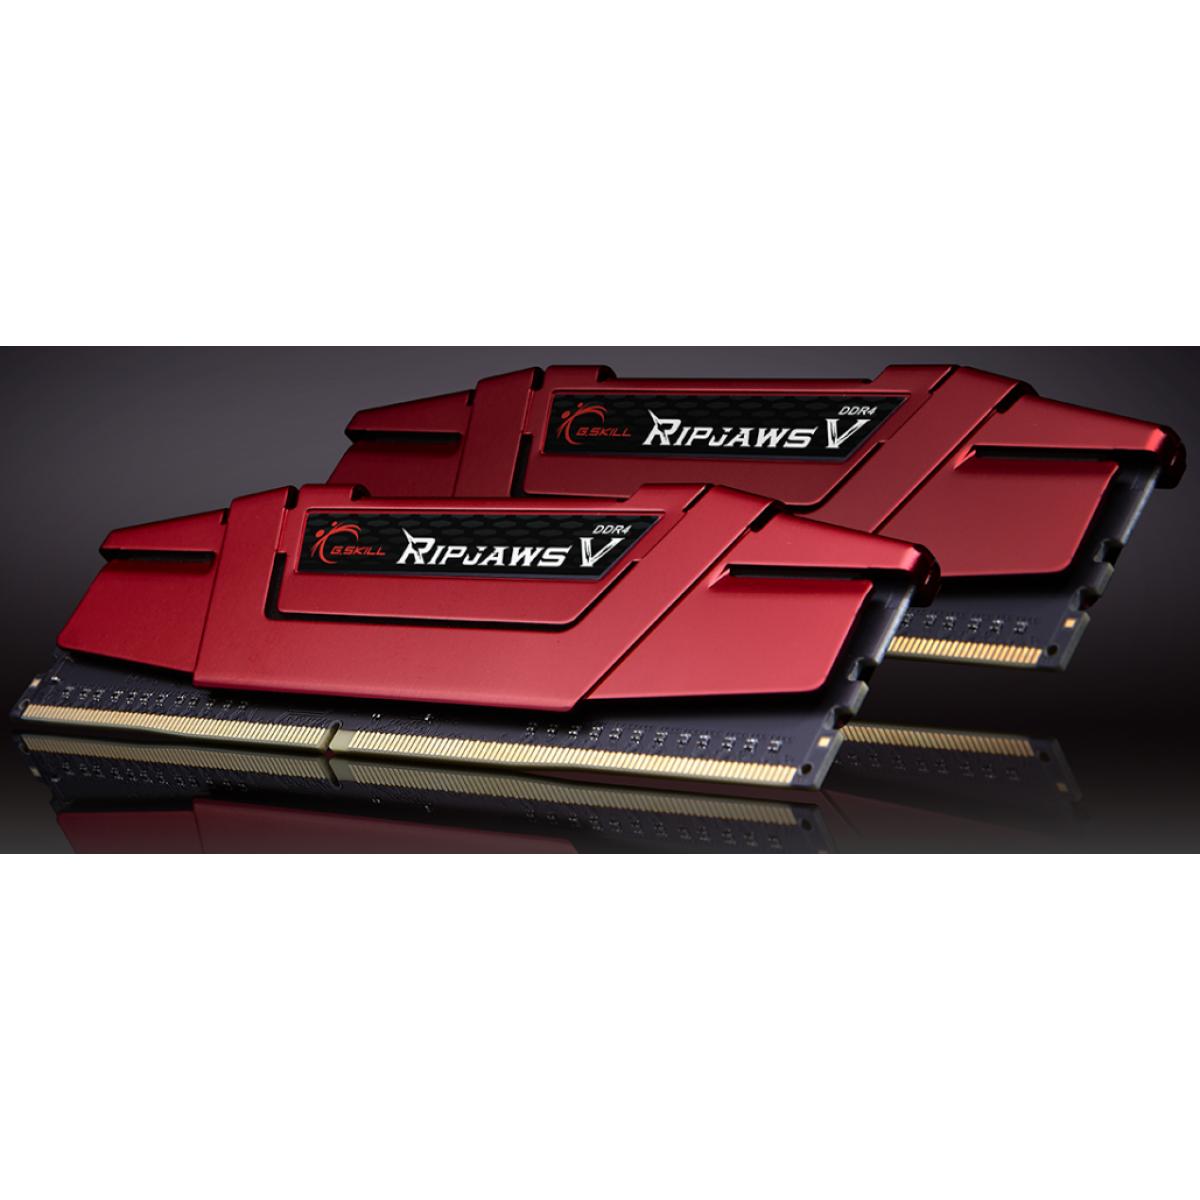 Memória DDR4 G.Skill Ripjaws V, 16GB (2x8GB) 2400MHz, F4-2400C15D-16GVR